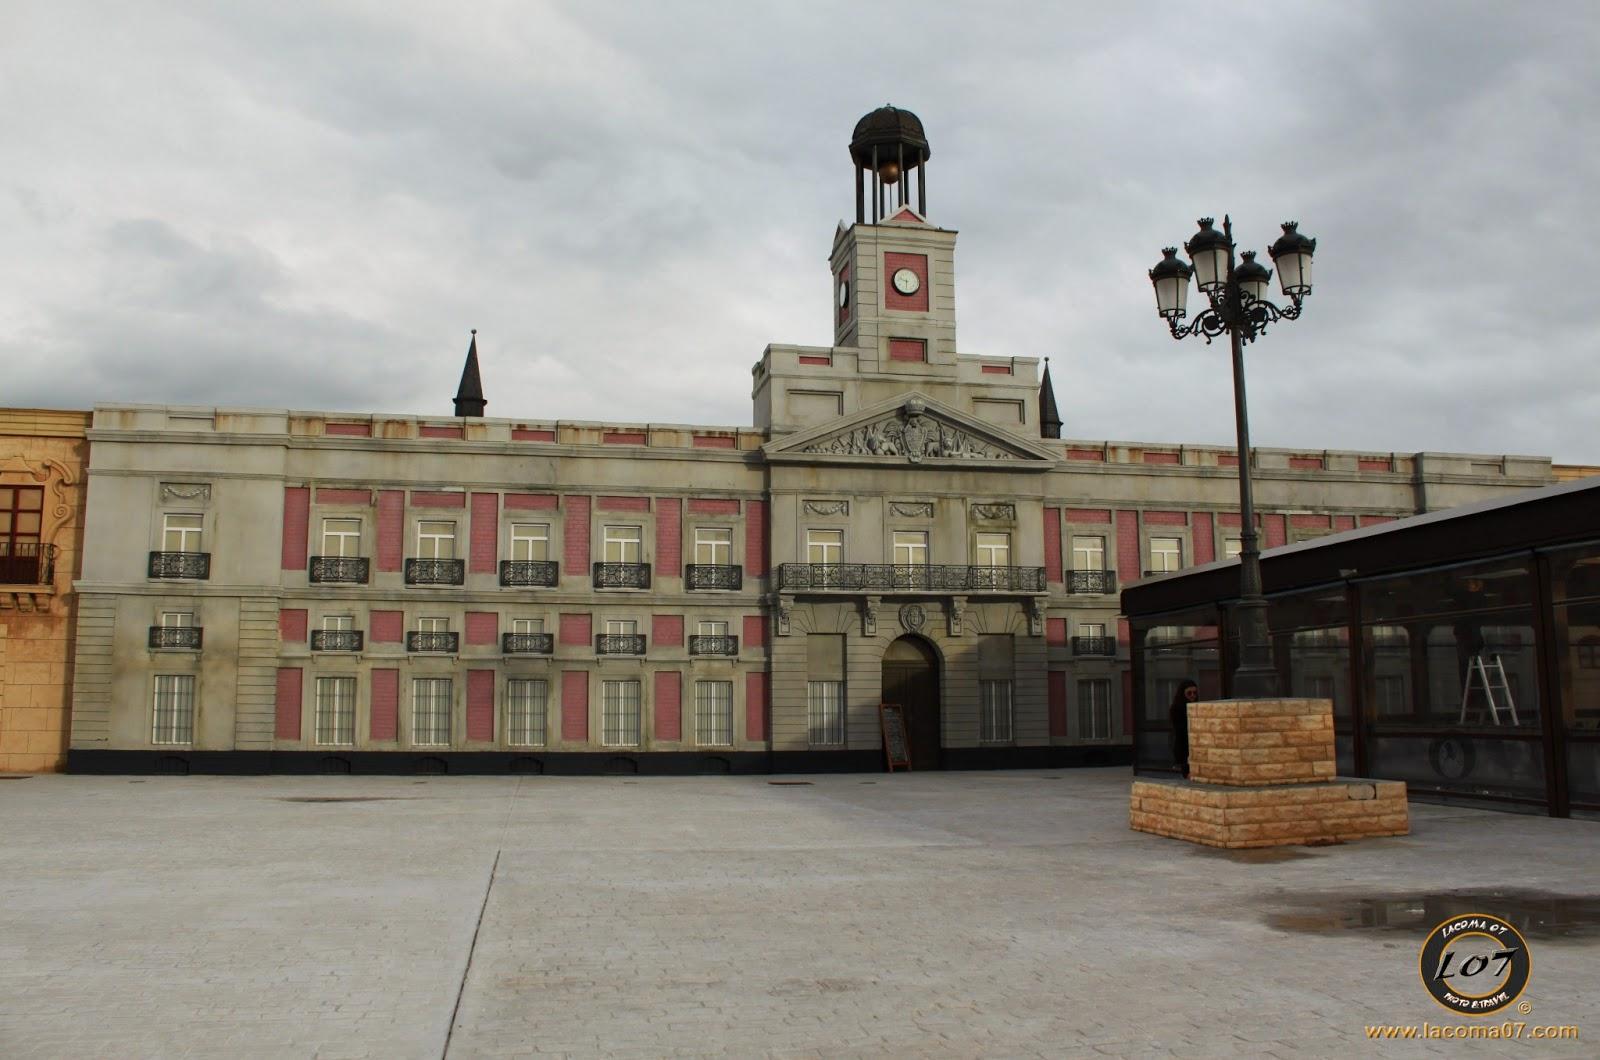 Fotografia Viajera Lacoma 07 Puerta Del Sol Parque Europa